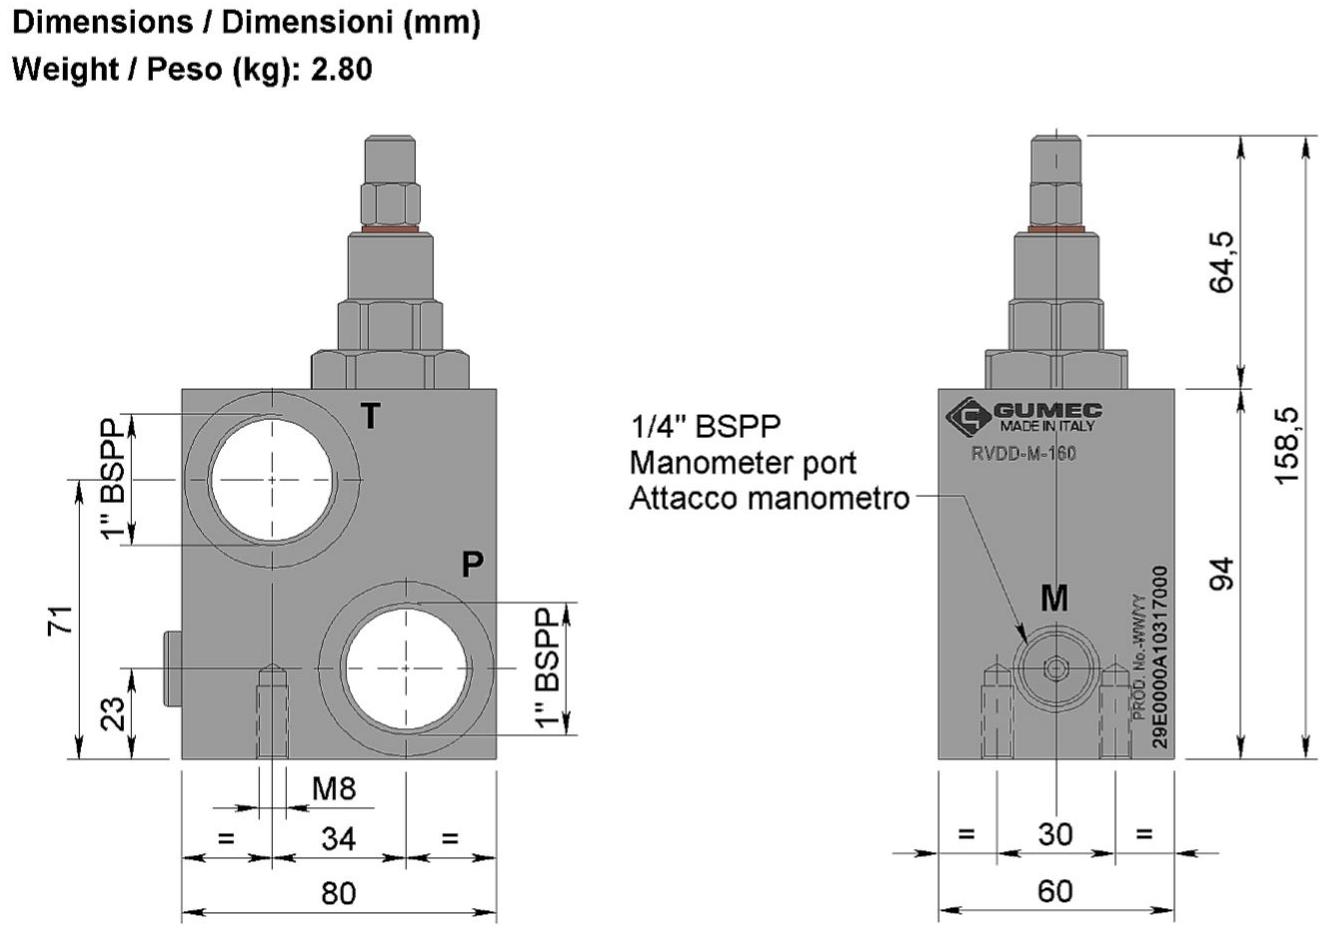 RVDD-M-160_2 схема